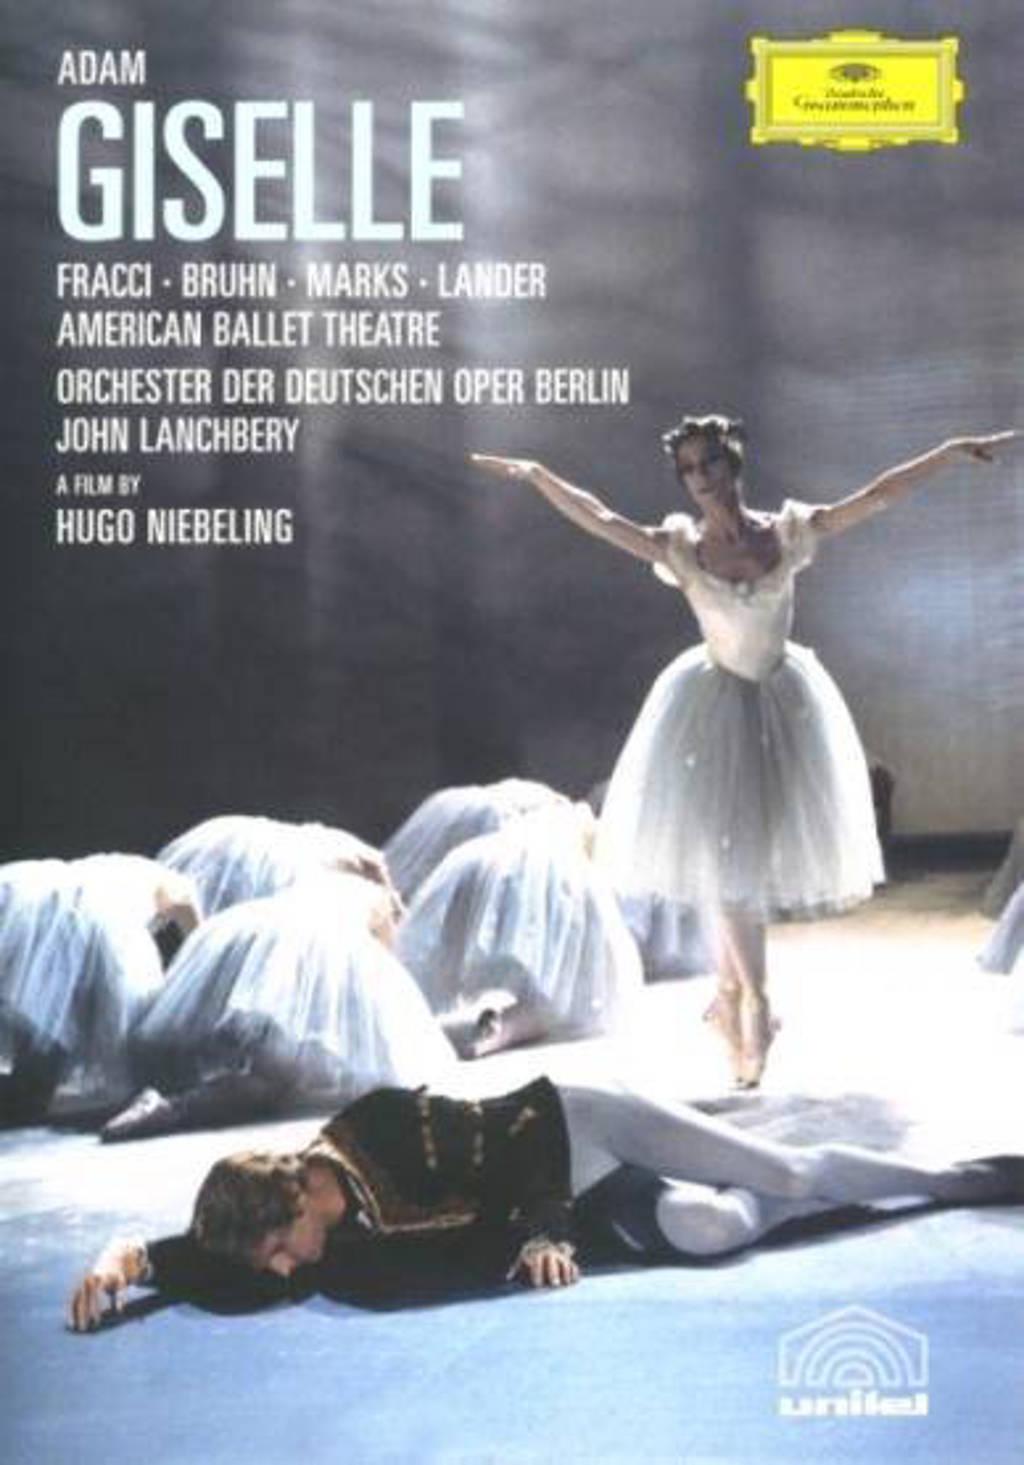 Adam - Giselle (DVD)